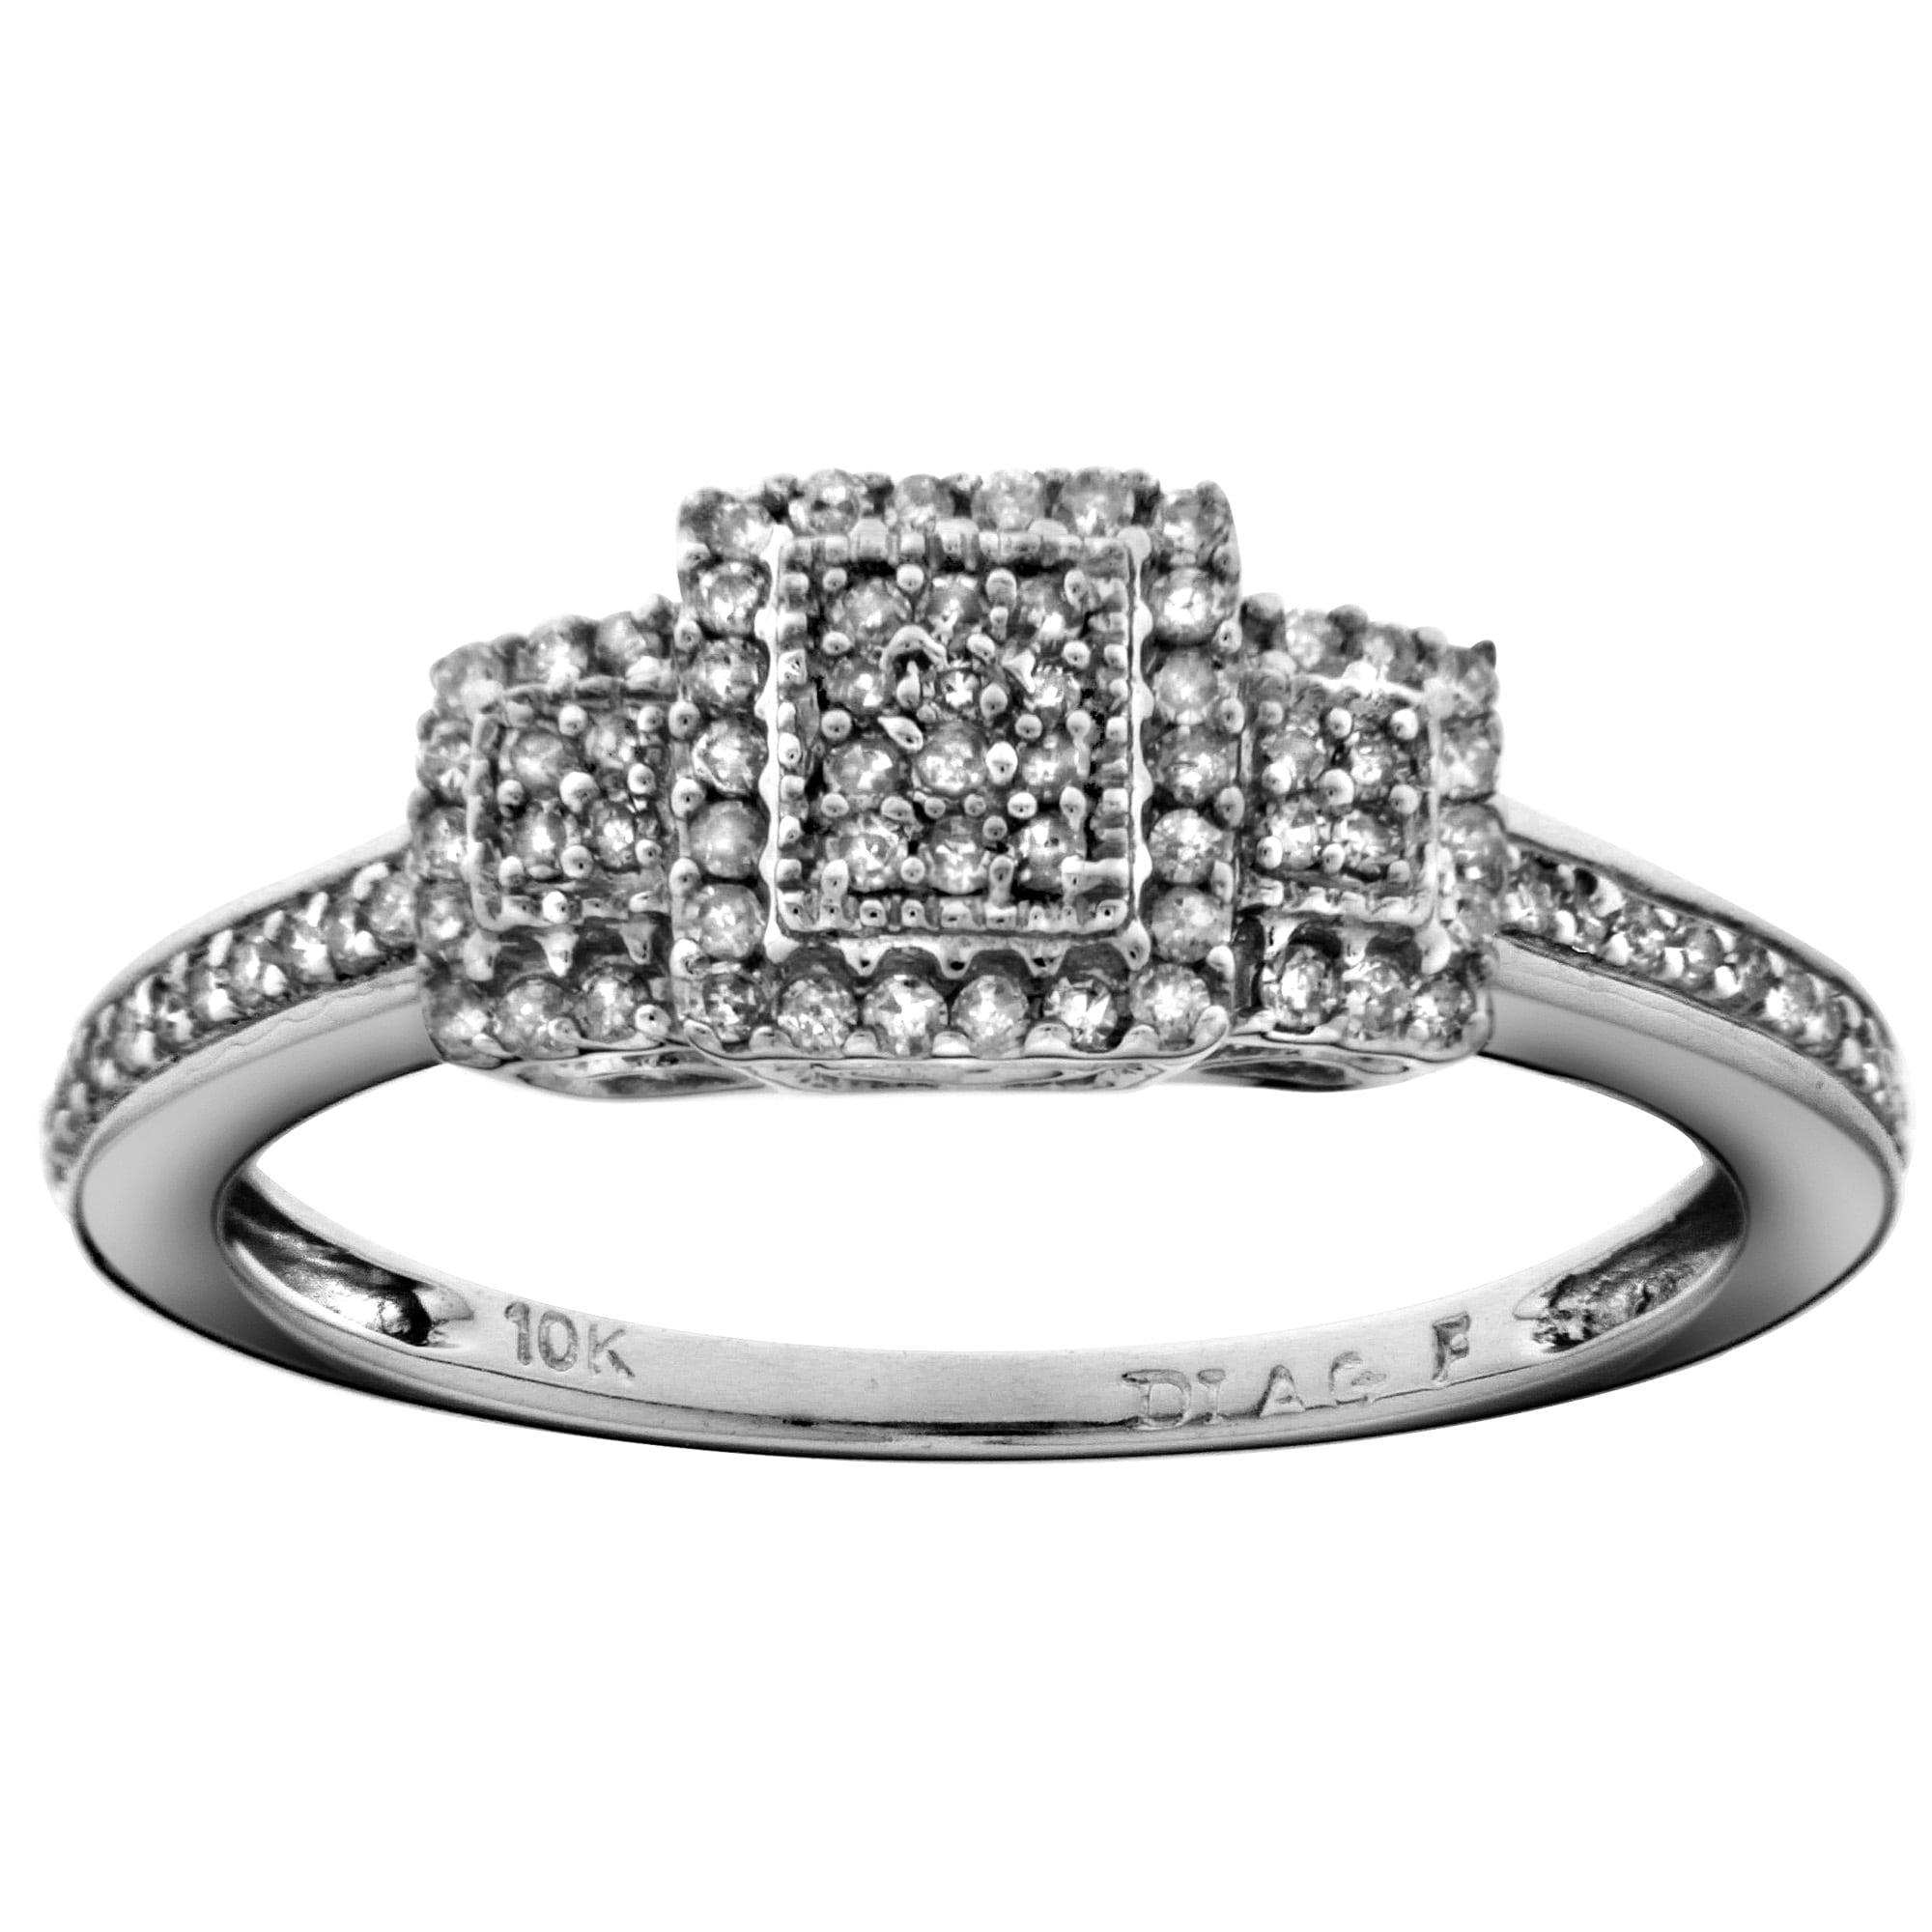 10k White Gold 1/4ct TDW Diamond Engagement Ring (H-I,I2-I3)